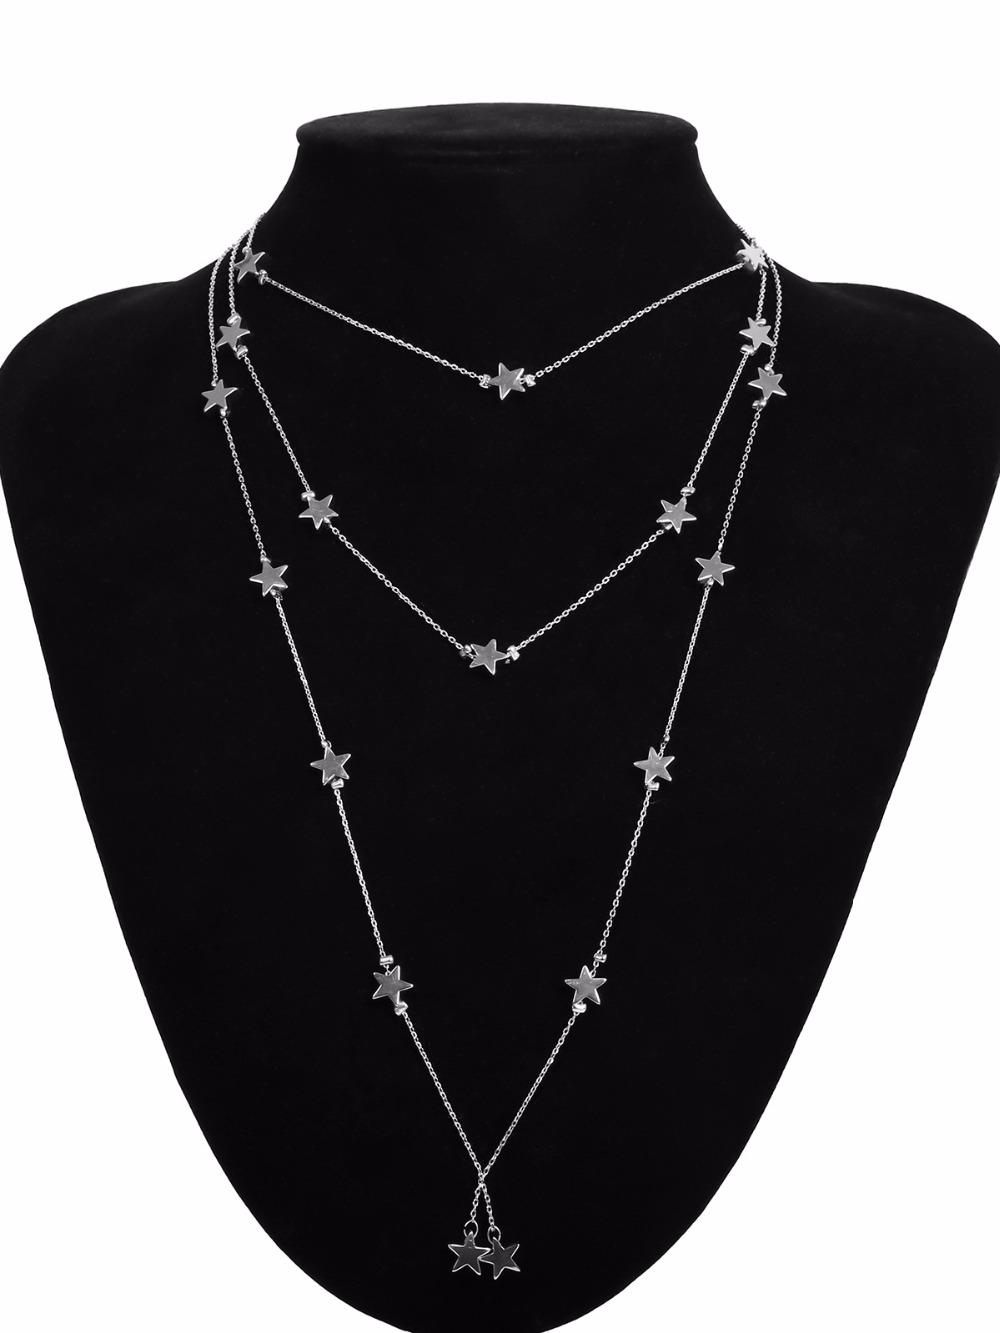 7377eadddd Material: Metal Pendant Size: 2mm*2mm. Gender: Women Color: Gold Long Necklace  Pendants: gold Choker necklace & Pendant Weight(Necklace & Pendant): 14.6g